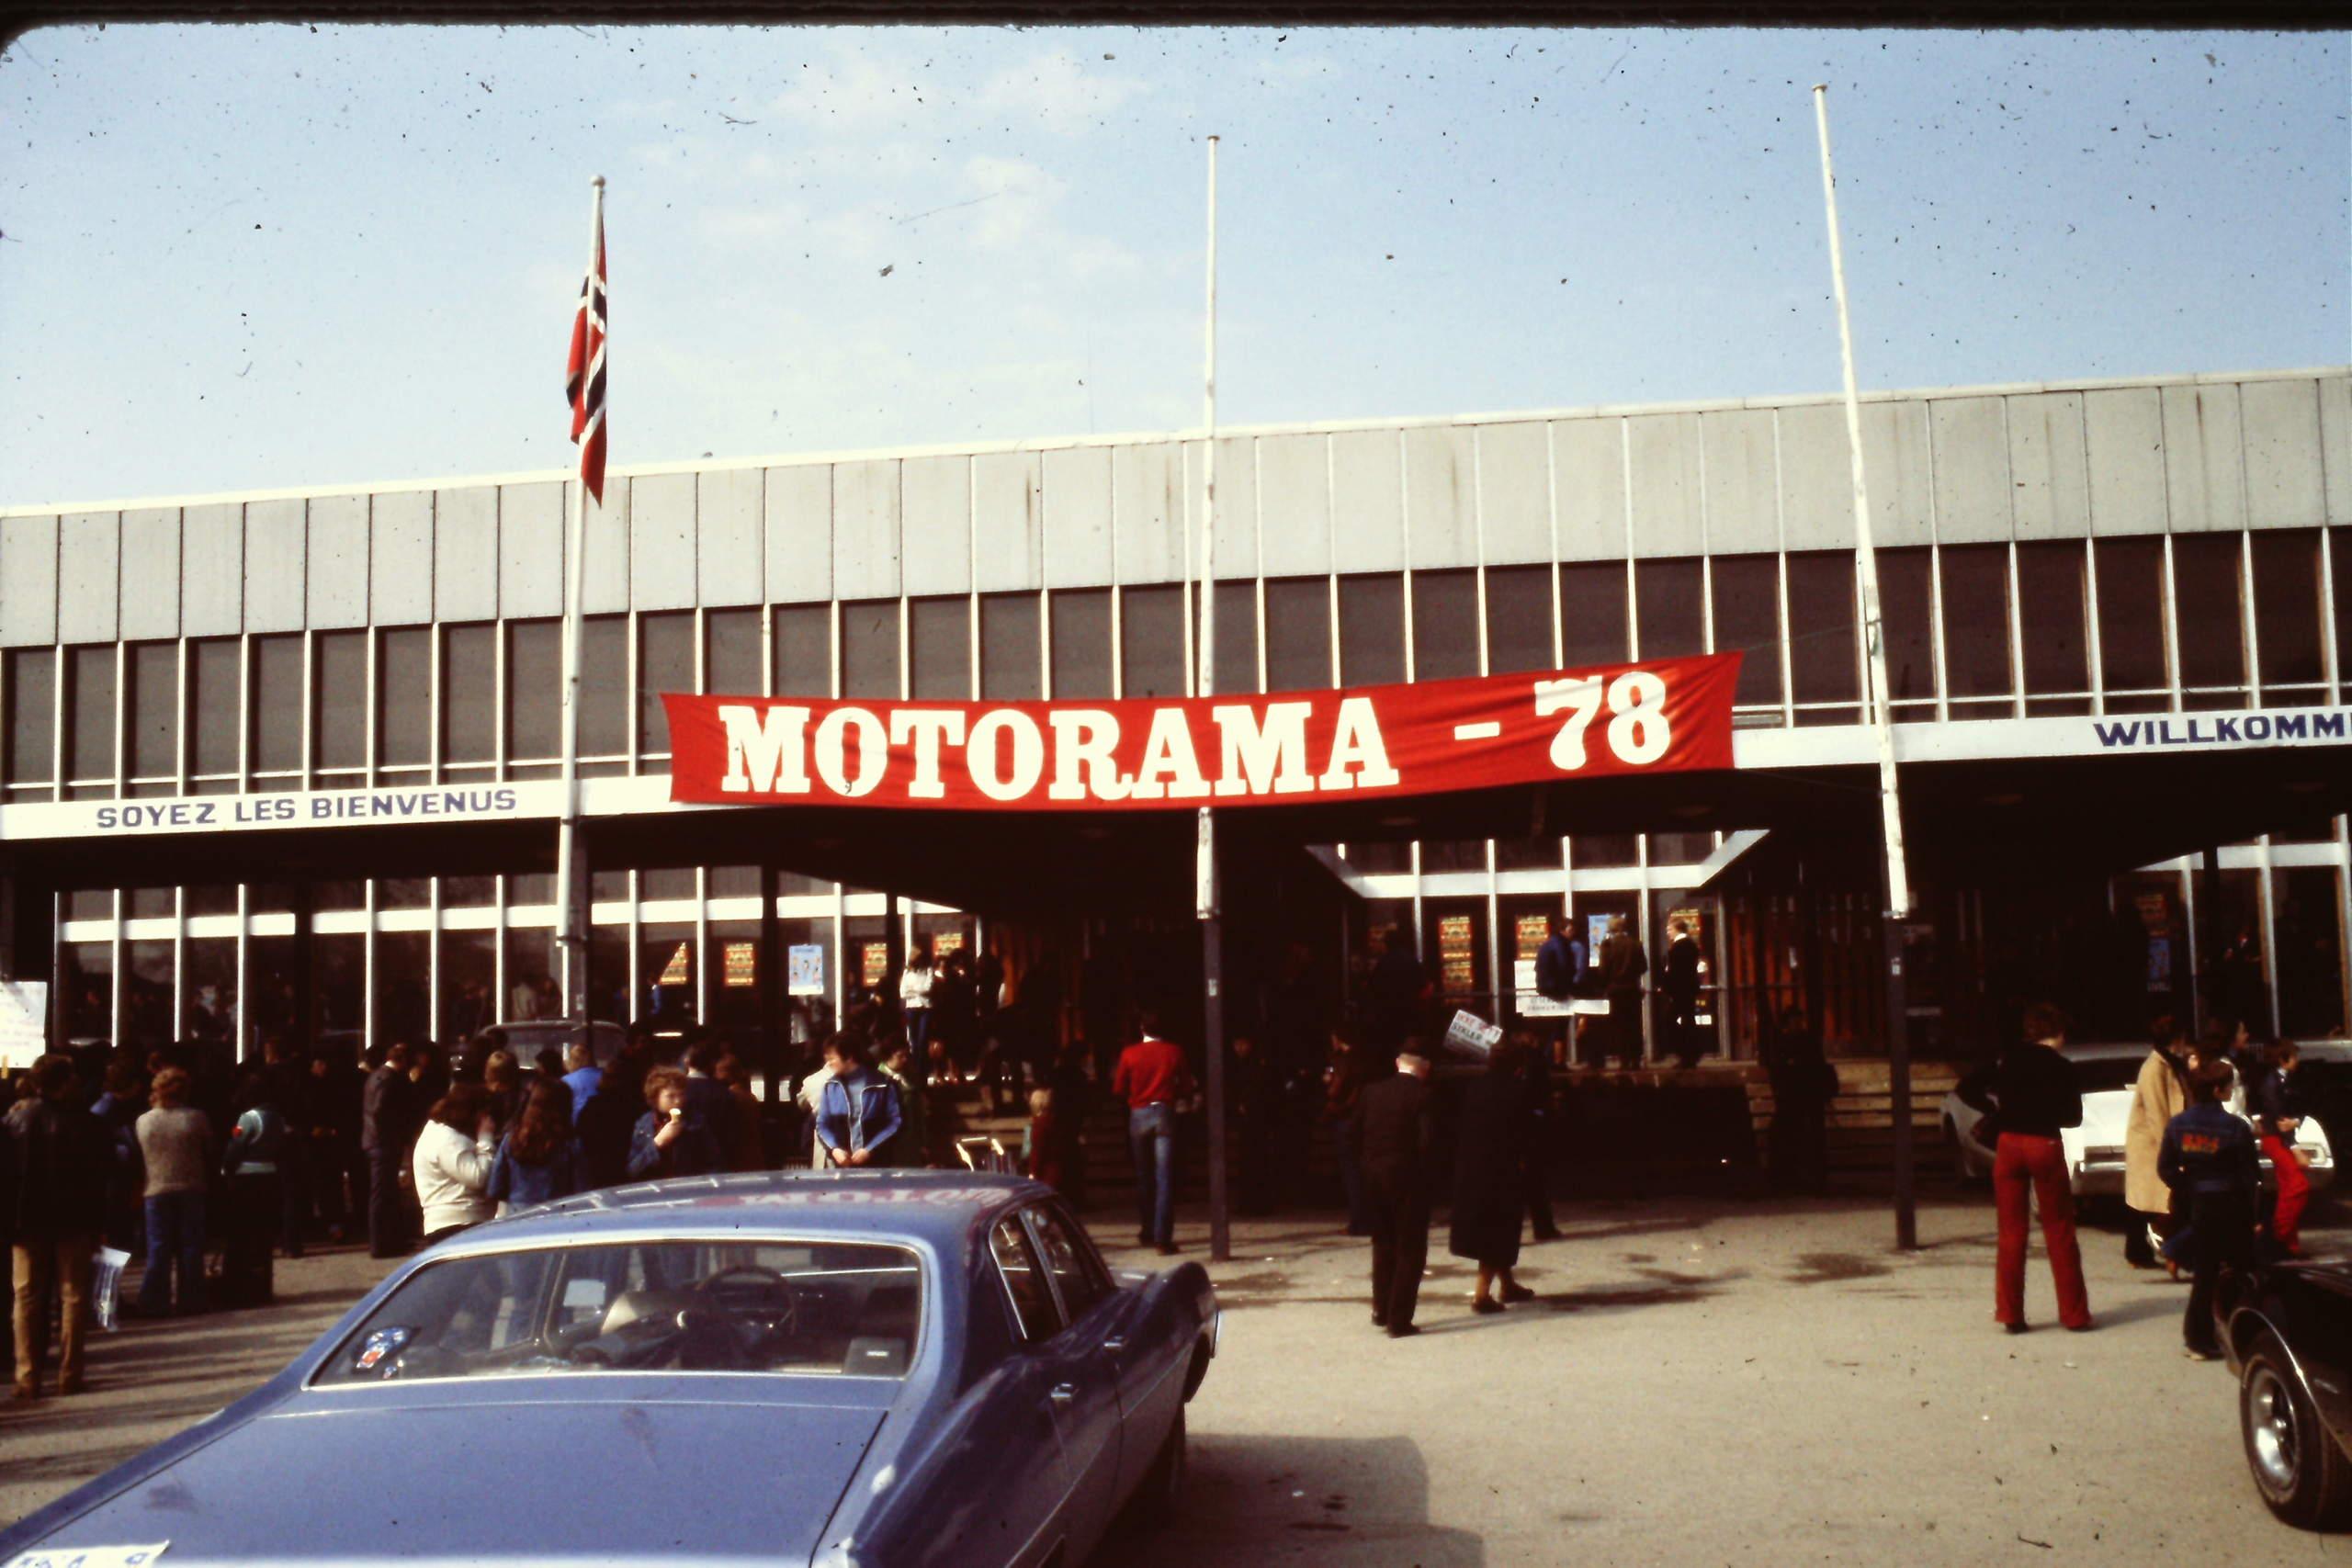 Motorama 1978 Amcar utstilling i Trondheim Classic Garage as